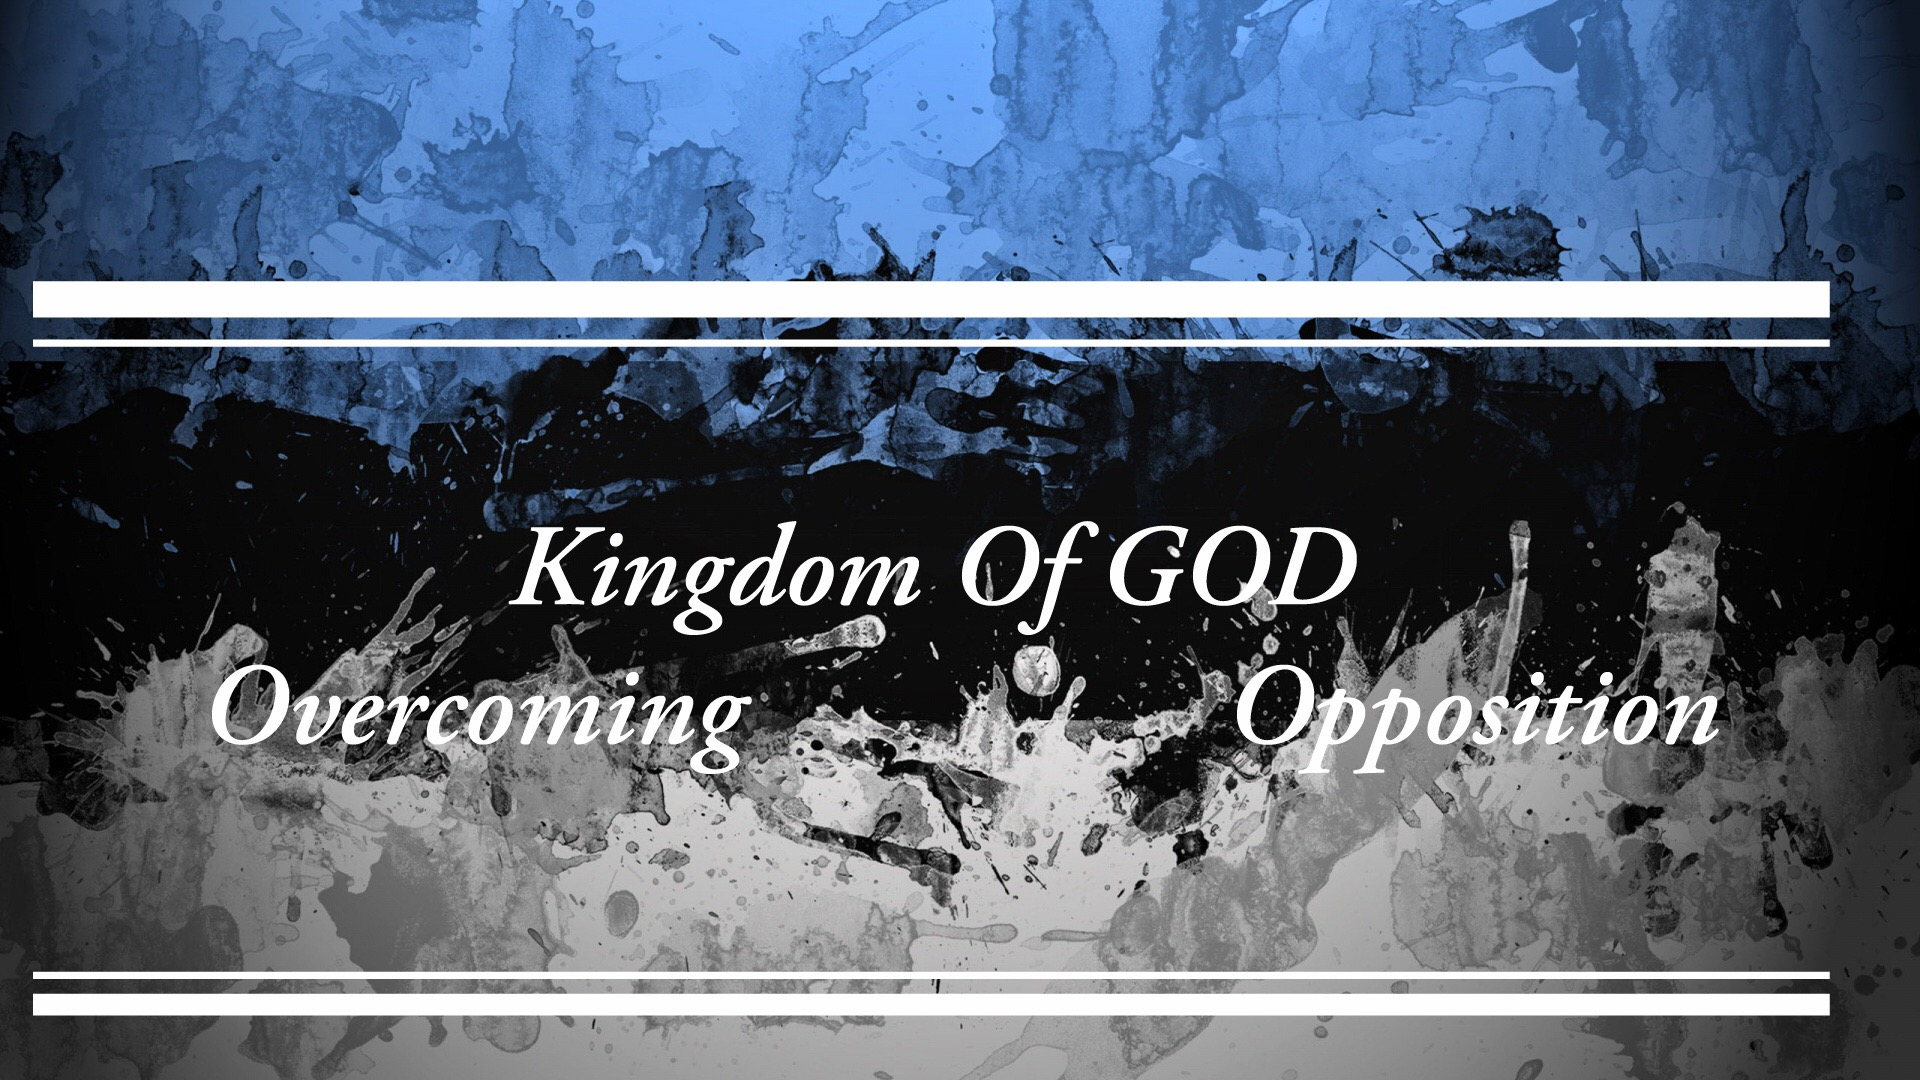 Kingdom Of GOD (Overcoming Opposition)